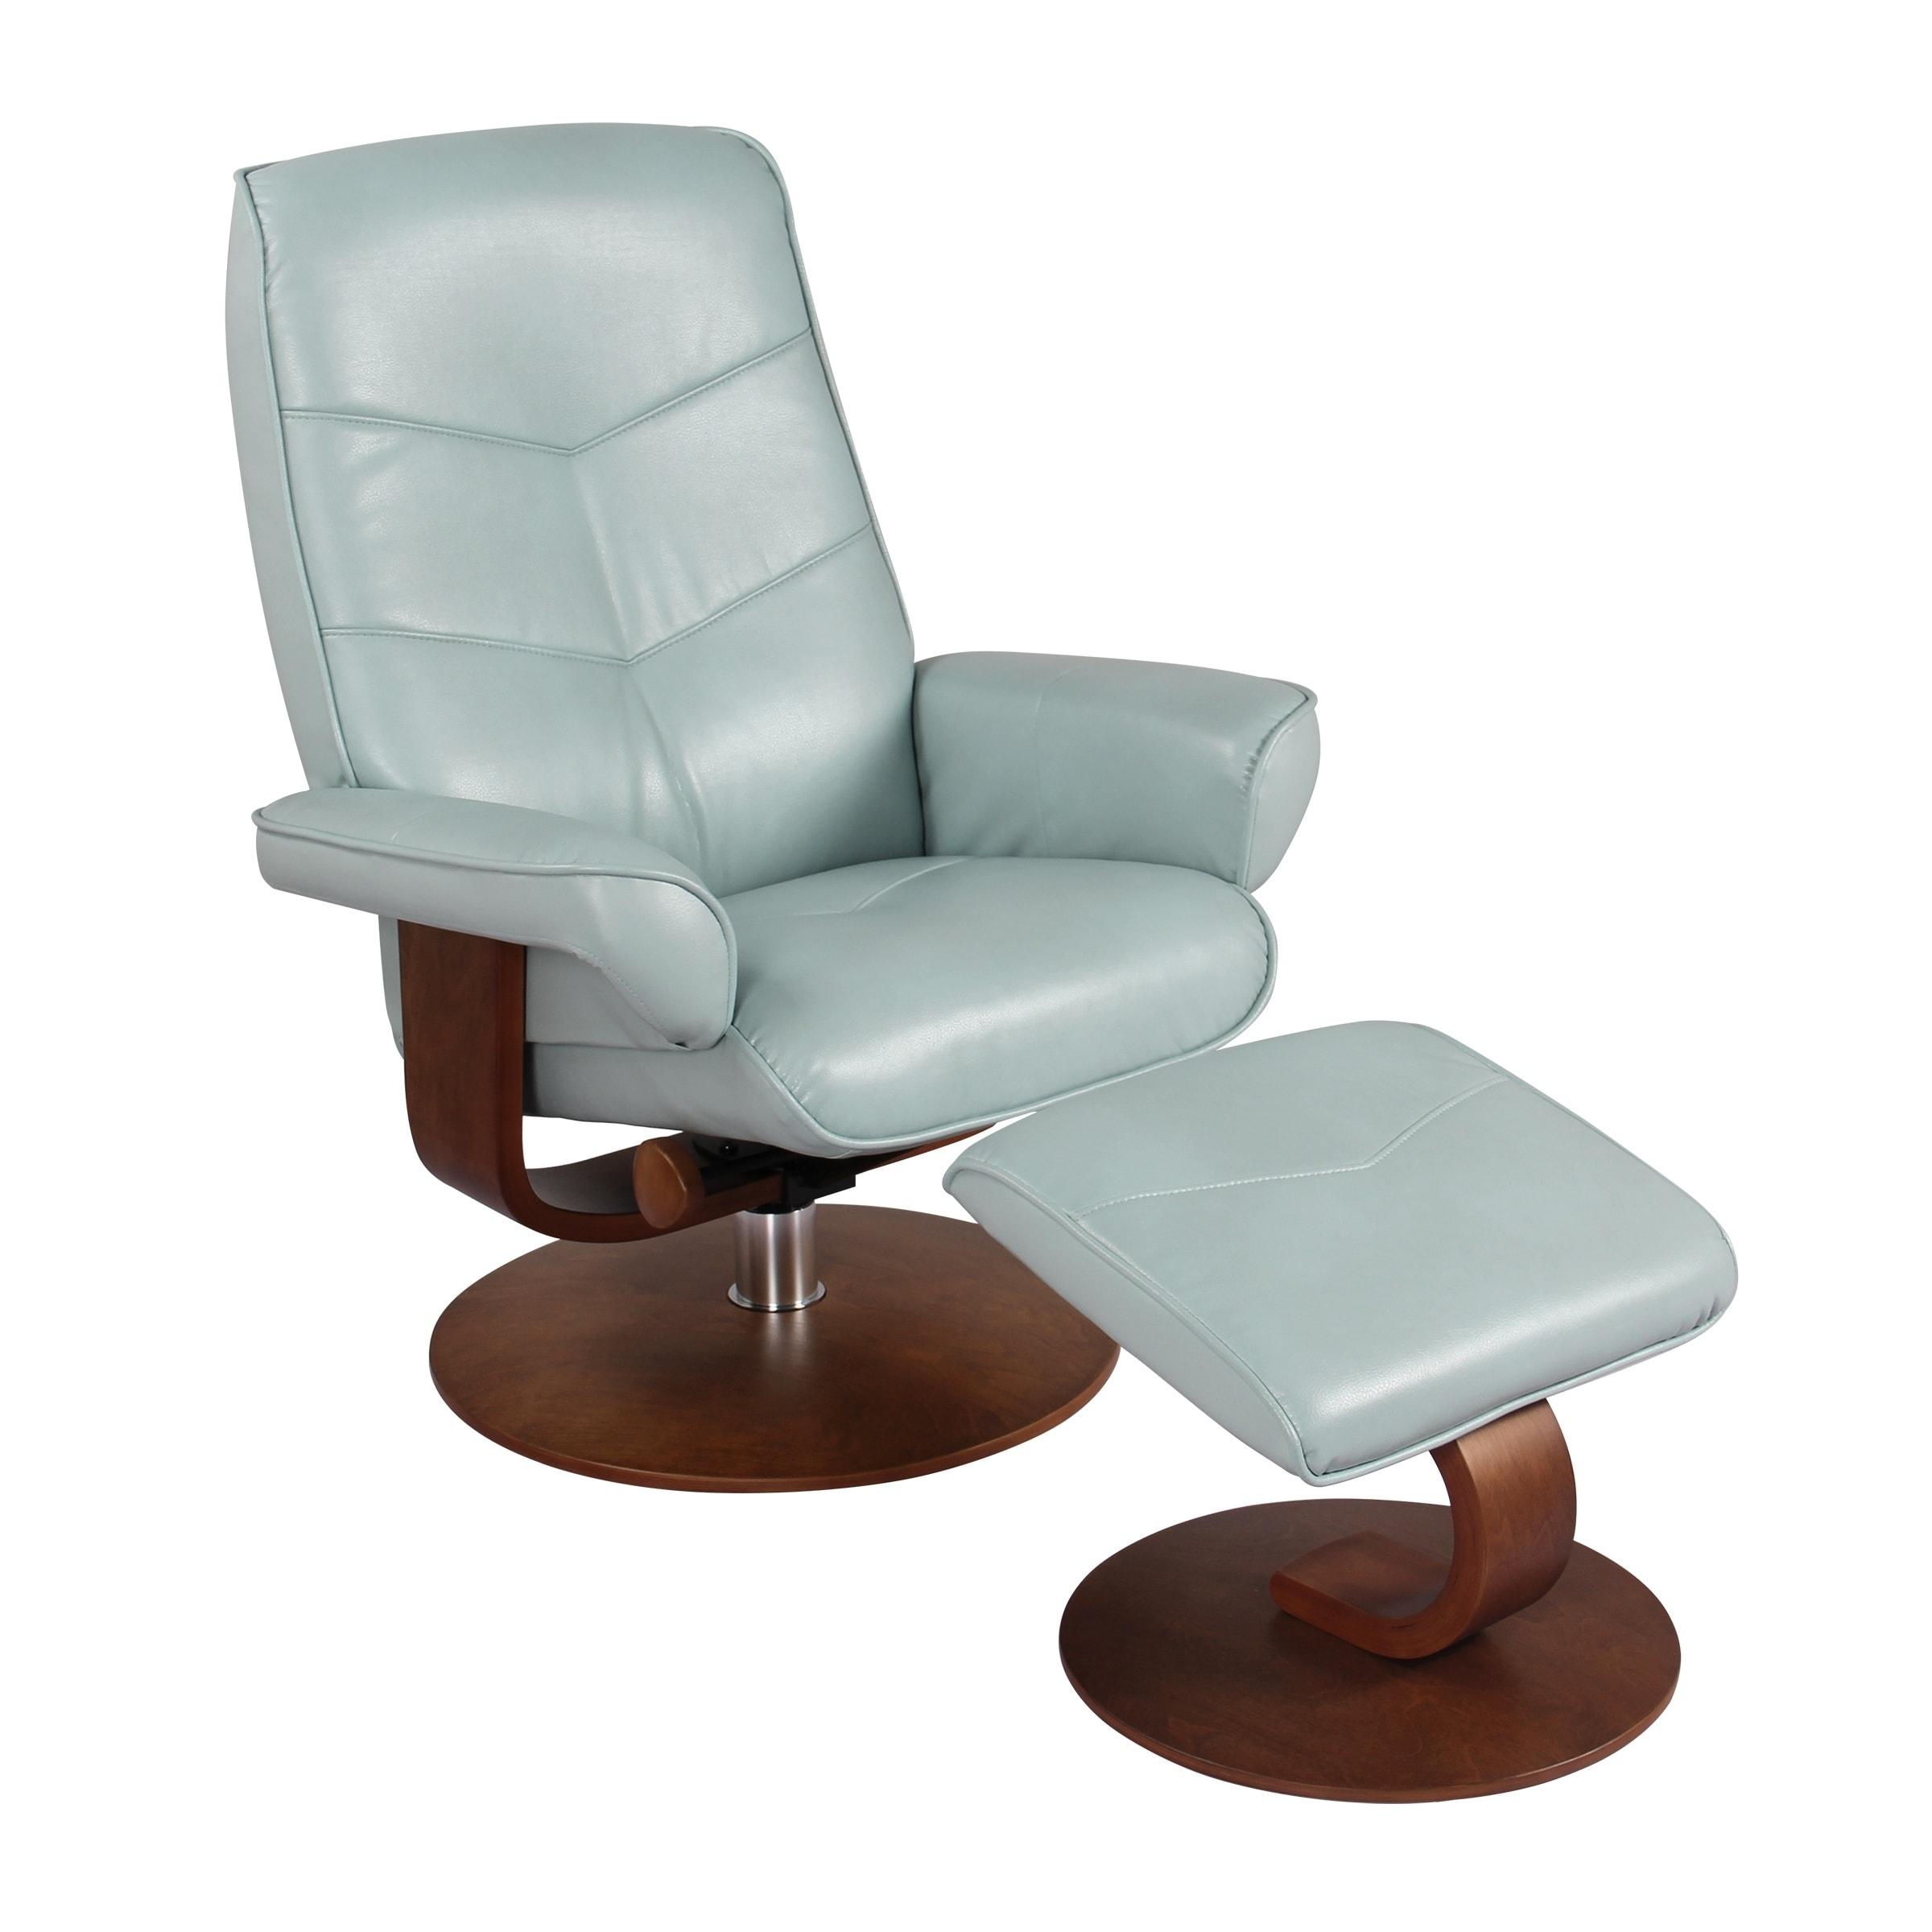 Shop New Ridge Home Swivel Recliner Chair U0026 Ottoman In Pastel Blue, Verona    Free Shipping Today   Overstock.com   21609664